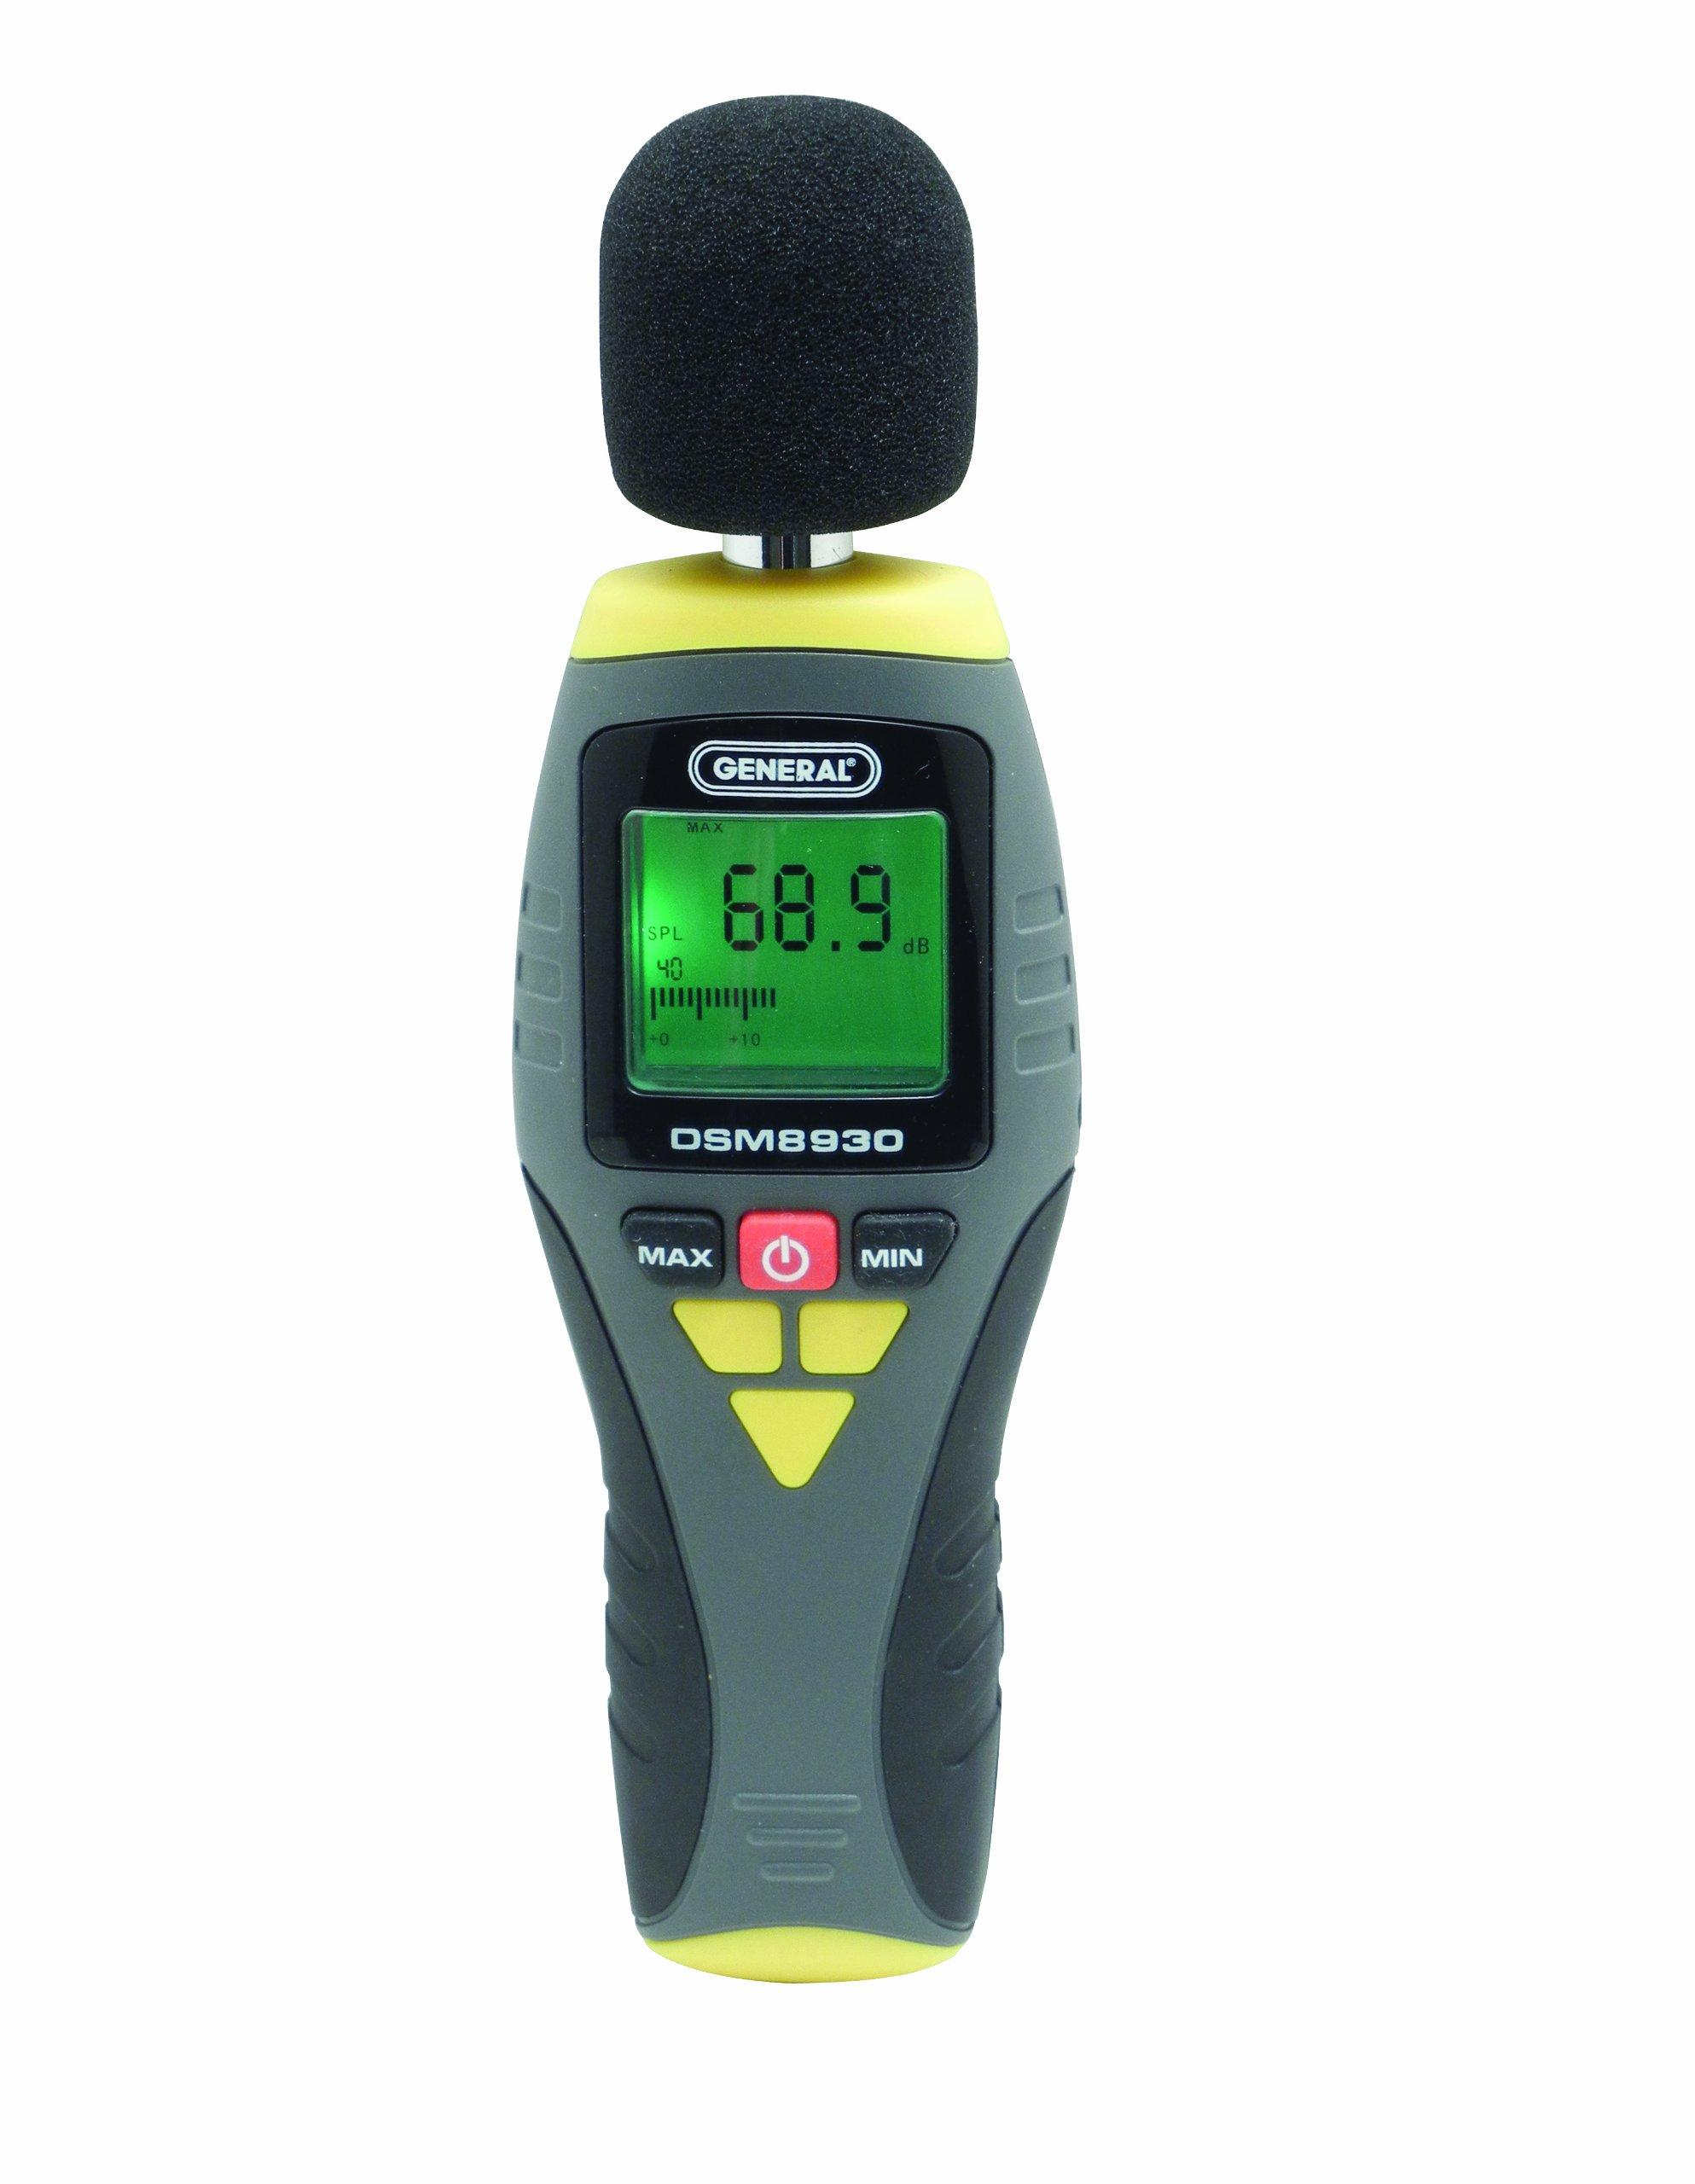 General Tools DSM8930 Digital Sound Level Meter, 100 Hz to 8.3 KHz